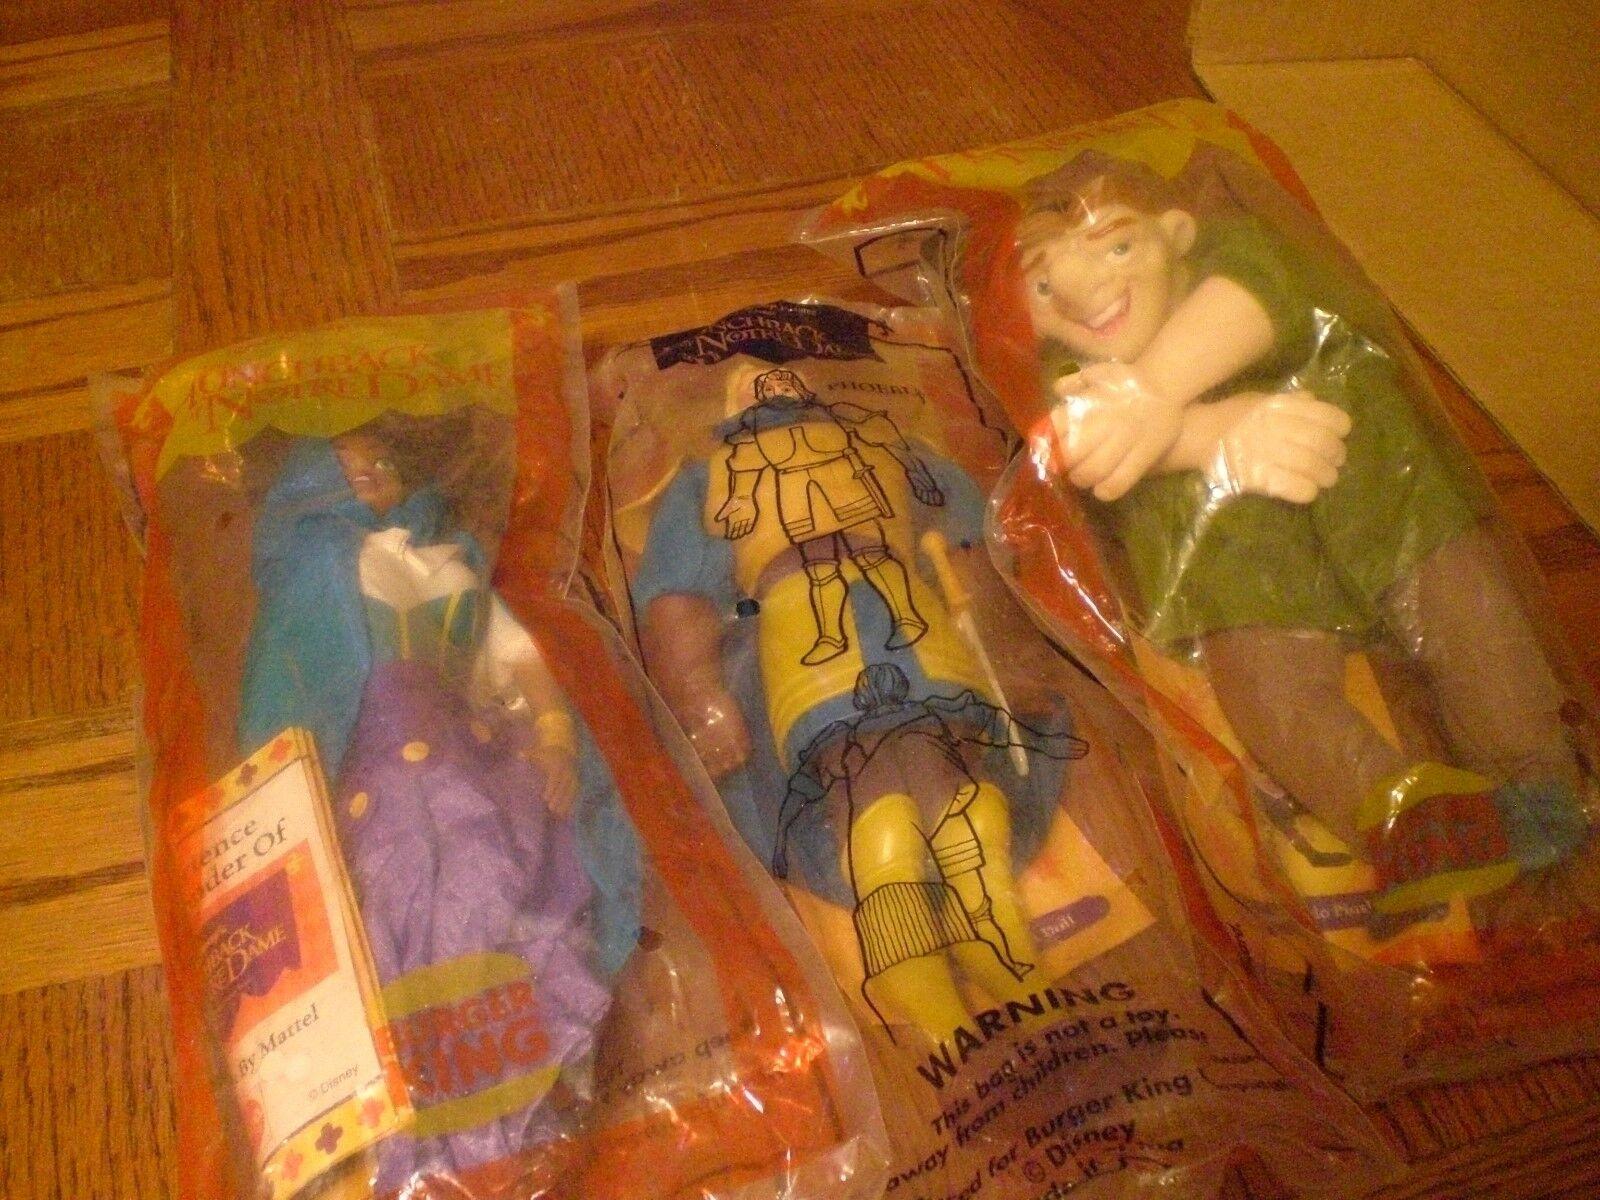 Retro Lote de tres 1995 10 Pulgadas Muñecas. Febo, Esmeralda, Quasimodo. Sellado.